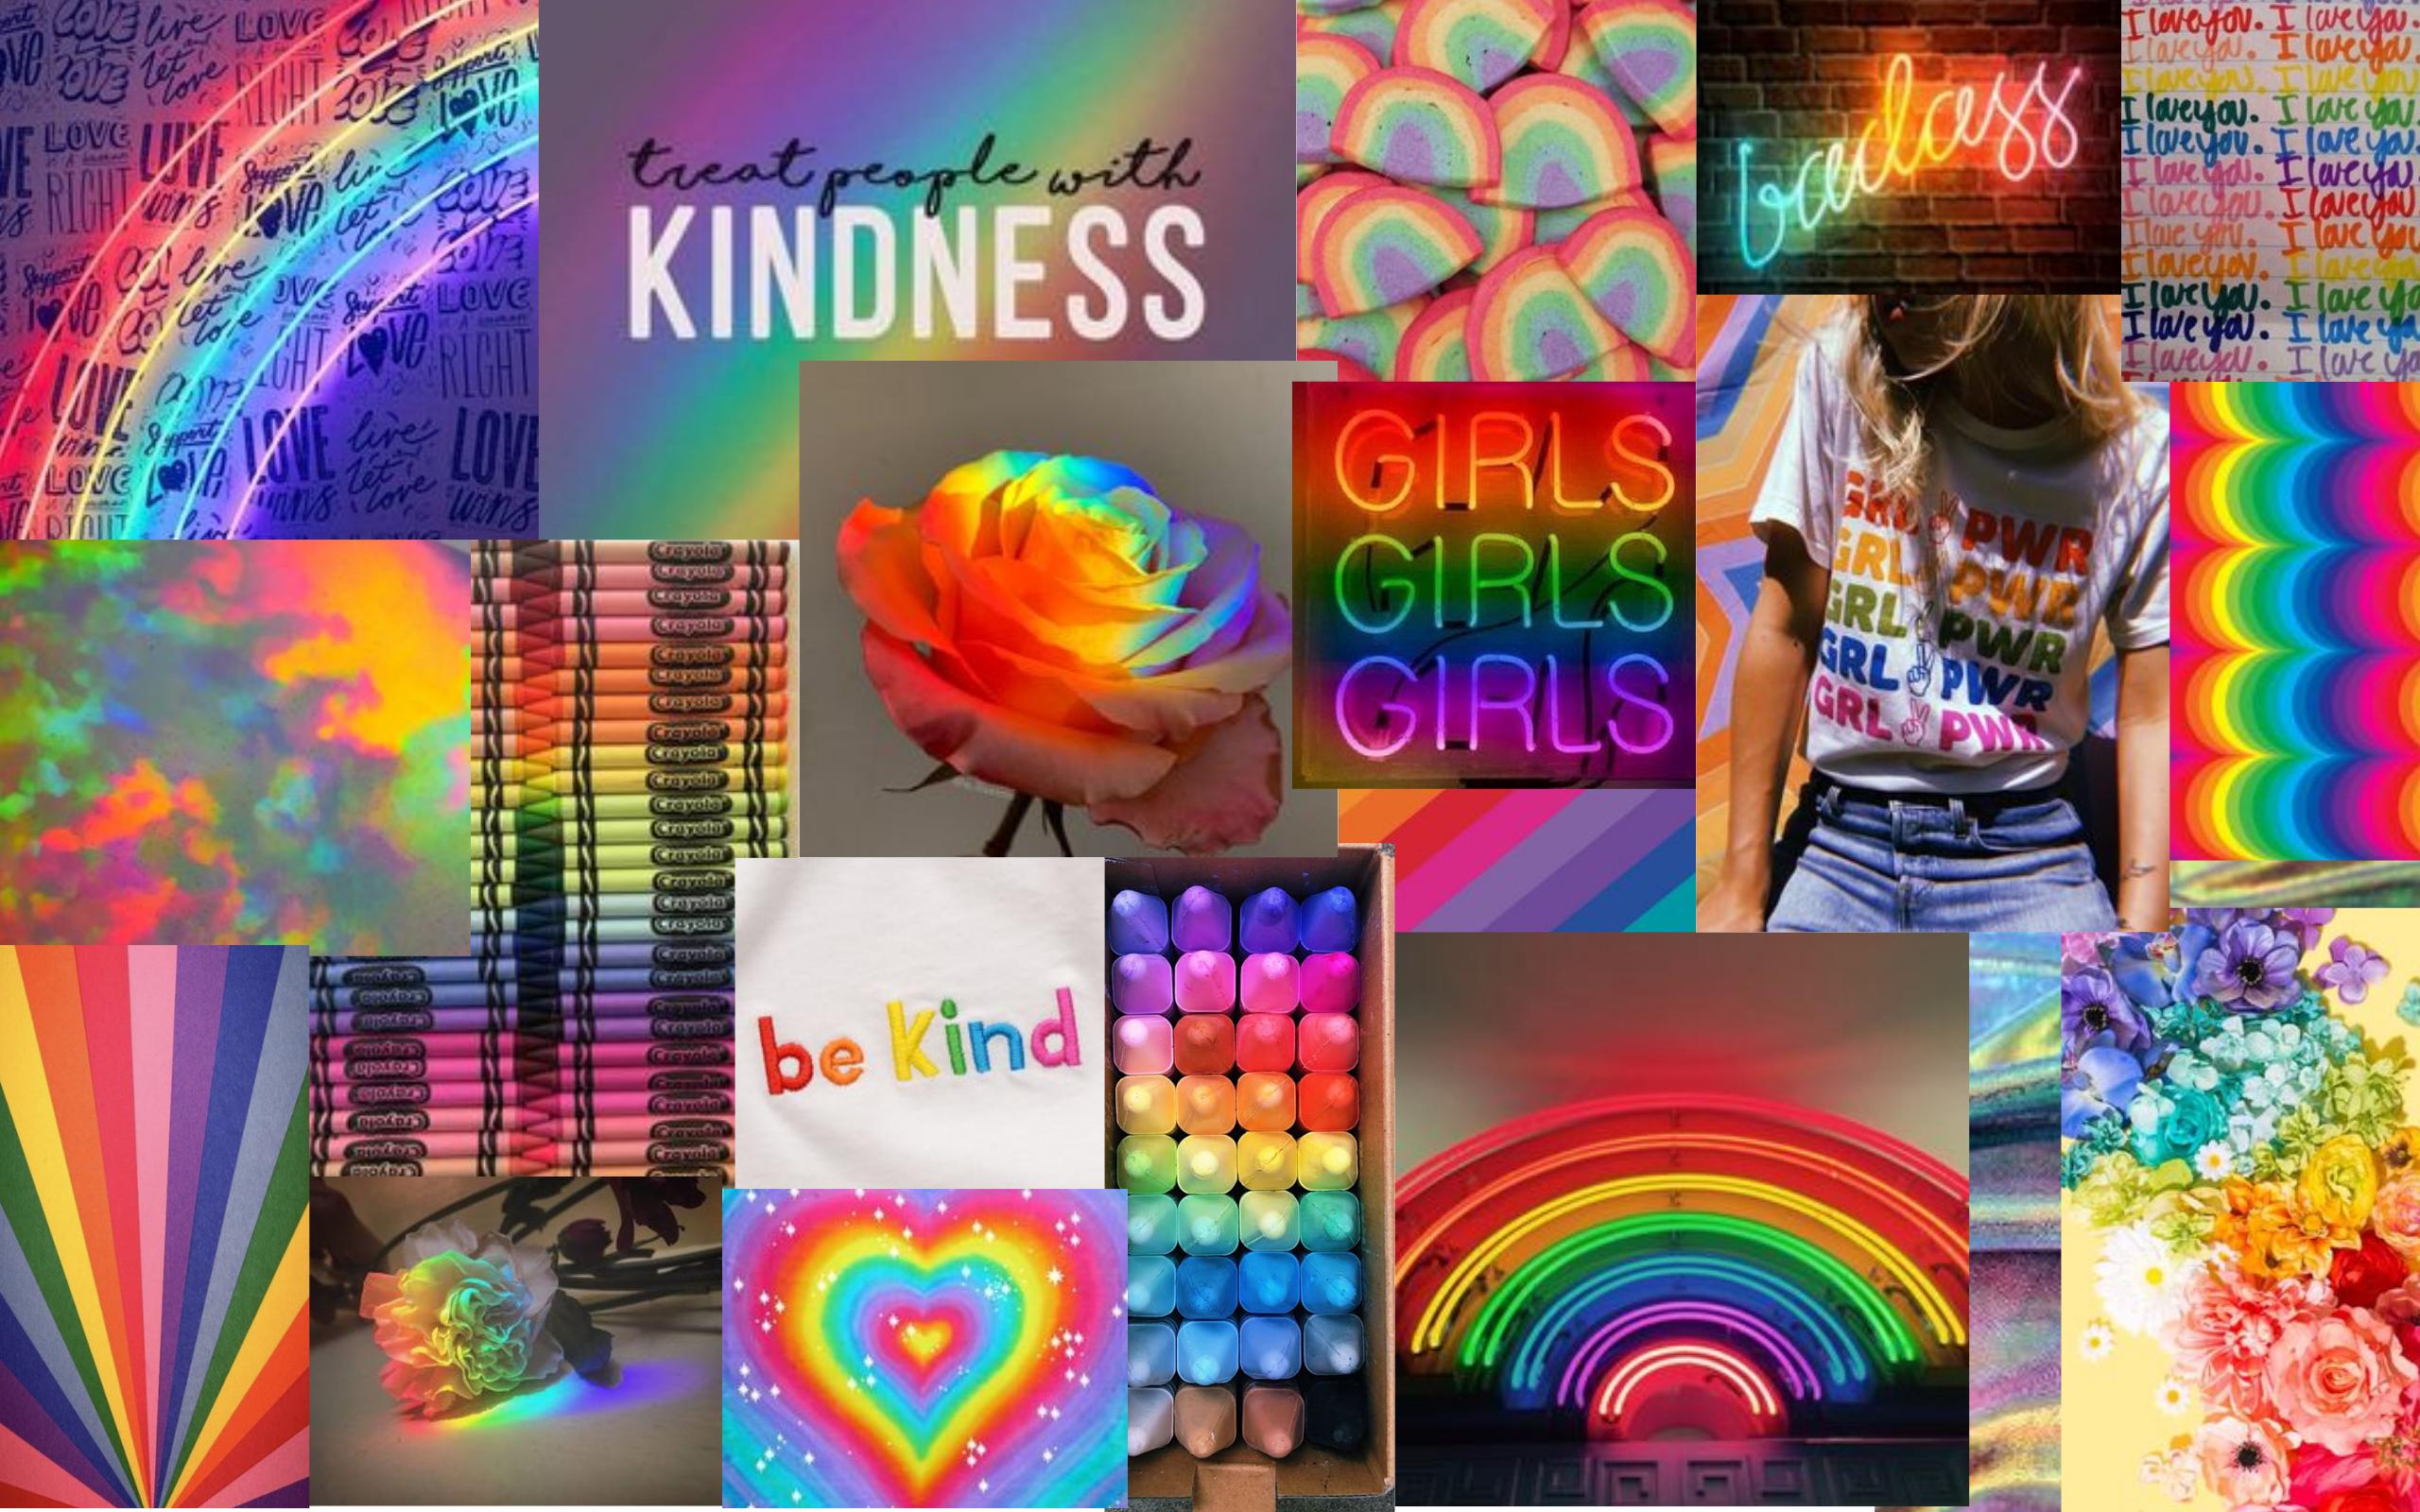 Rainbow Aesthetic Wallpaper In 2021 Rainbow Aesthetic Rainbow Wallpaper Laptop Wallpaper